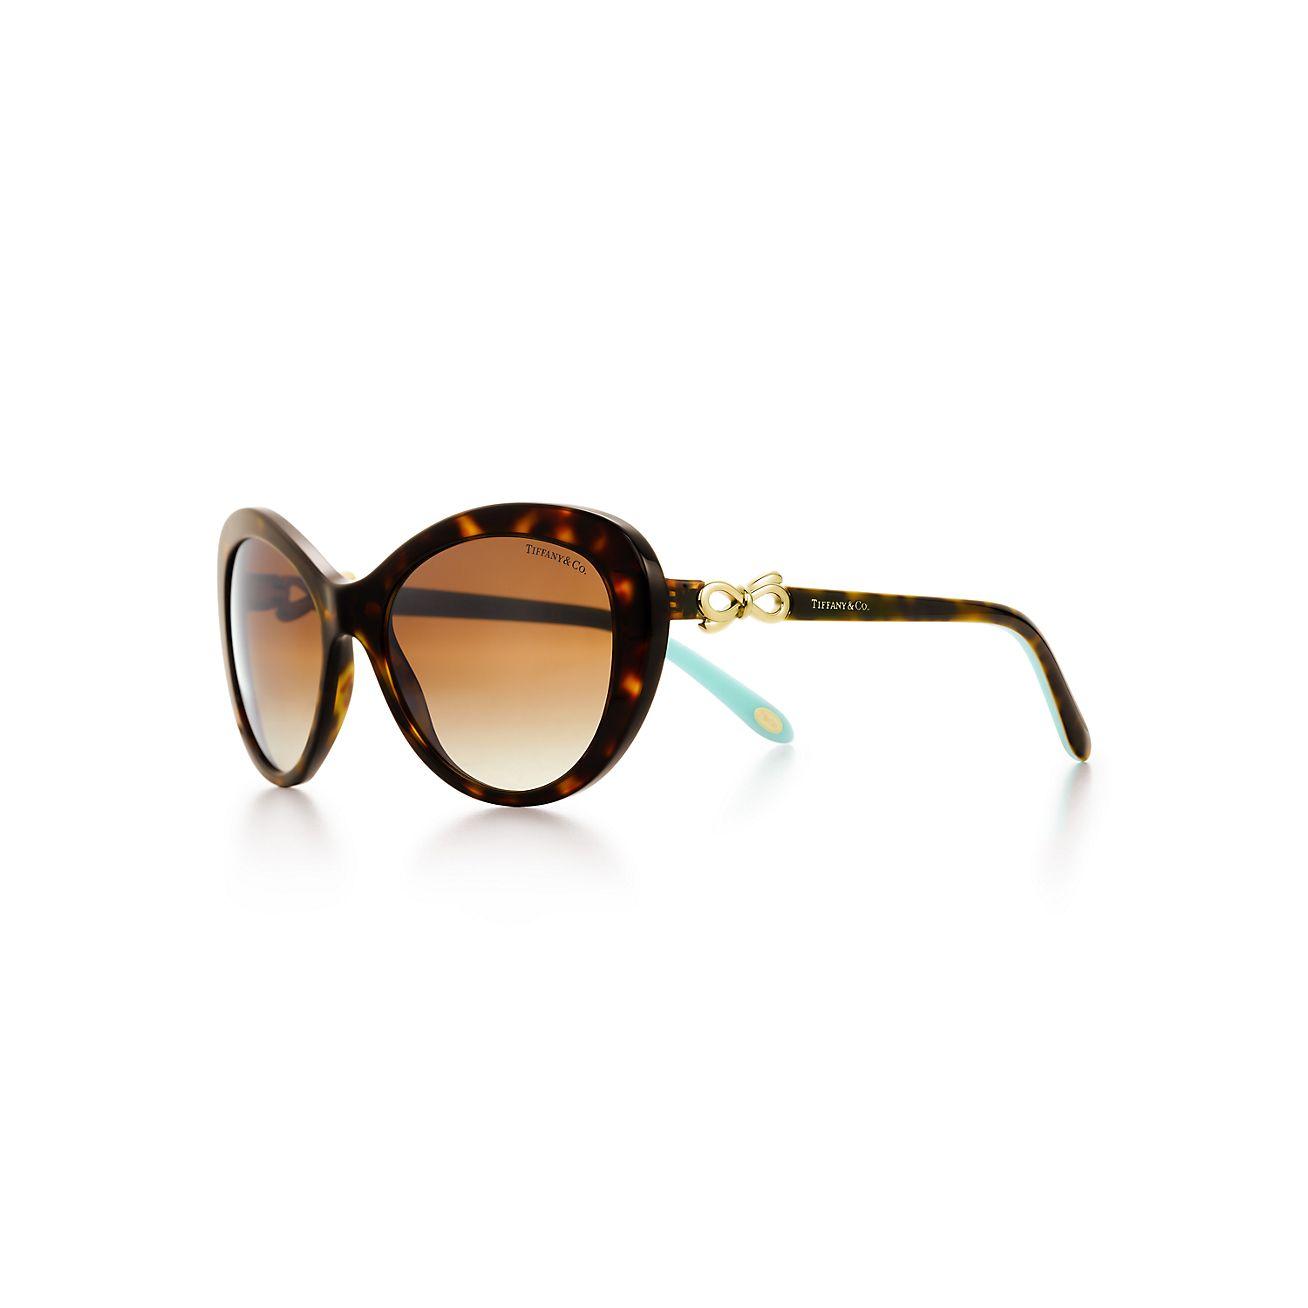 Tiffany Bow cat eye sunglasses in tortoise acetate ...